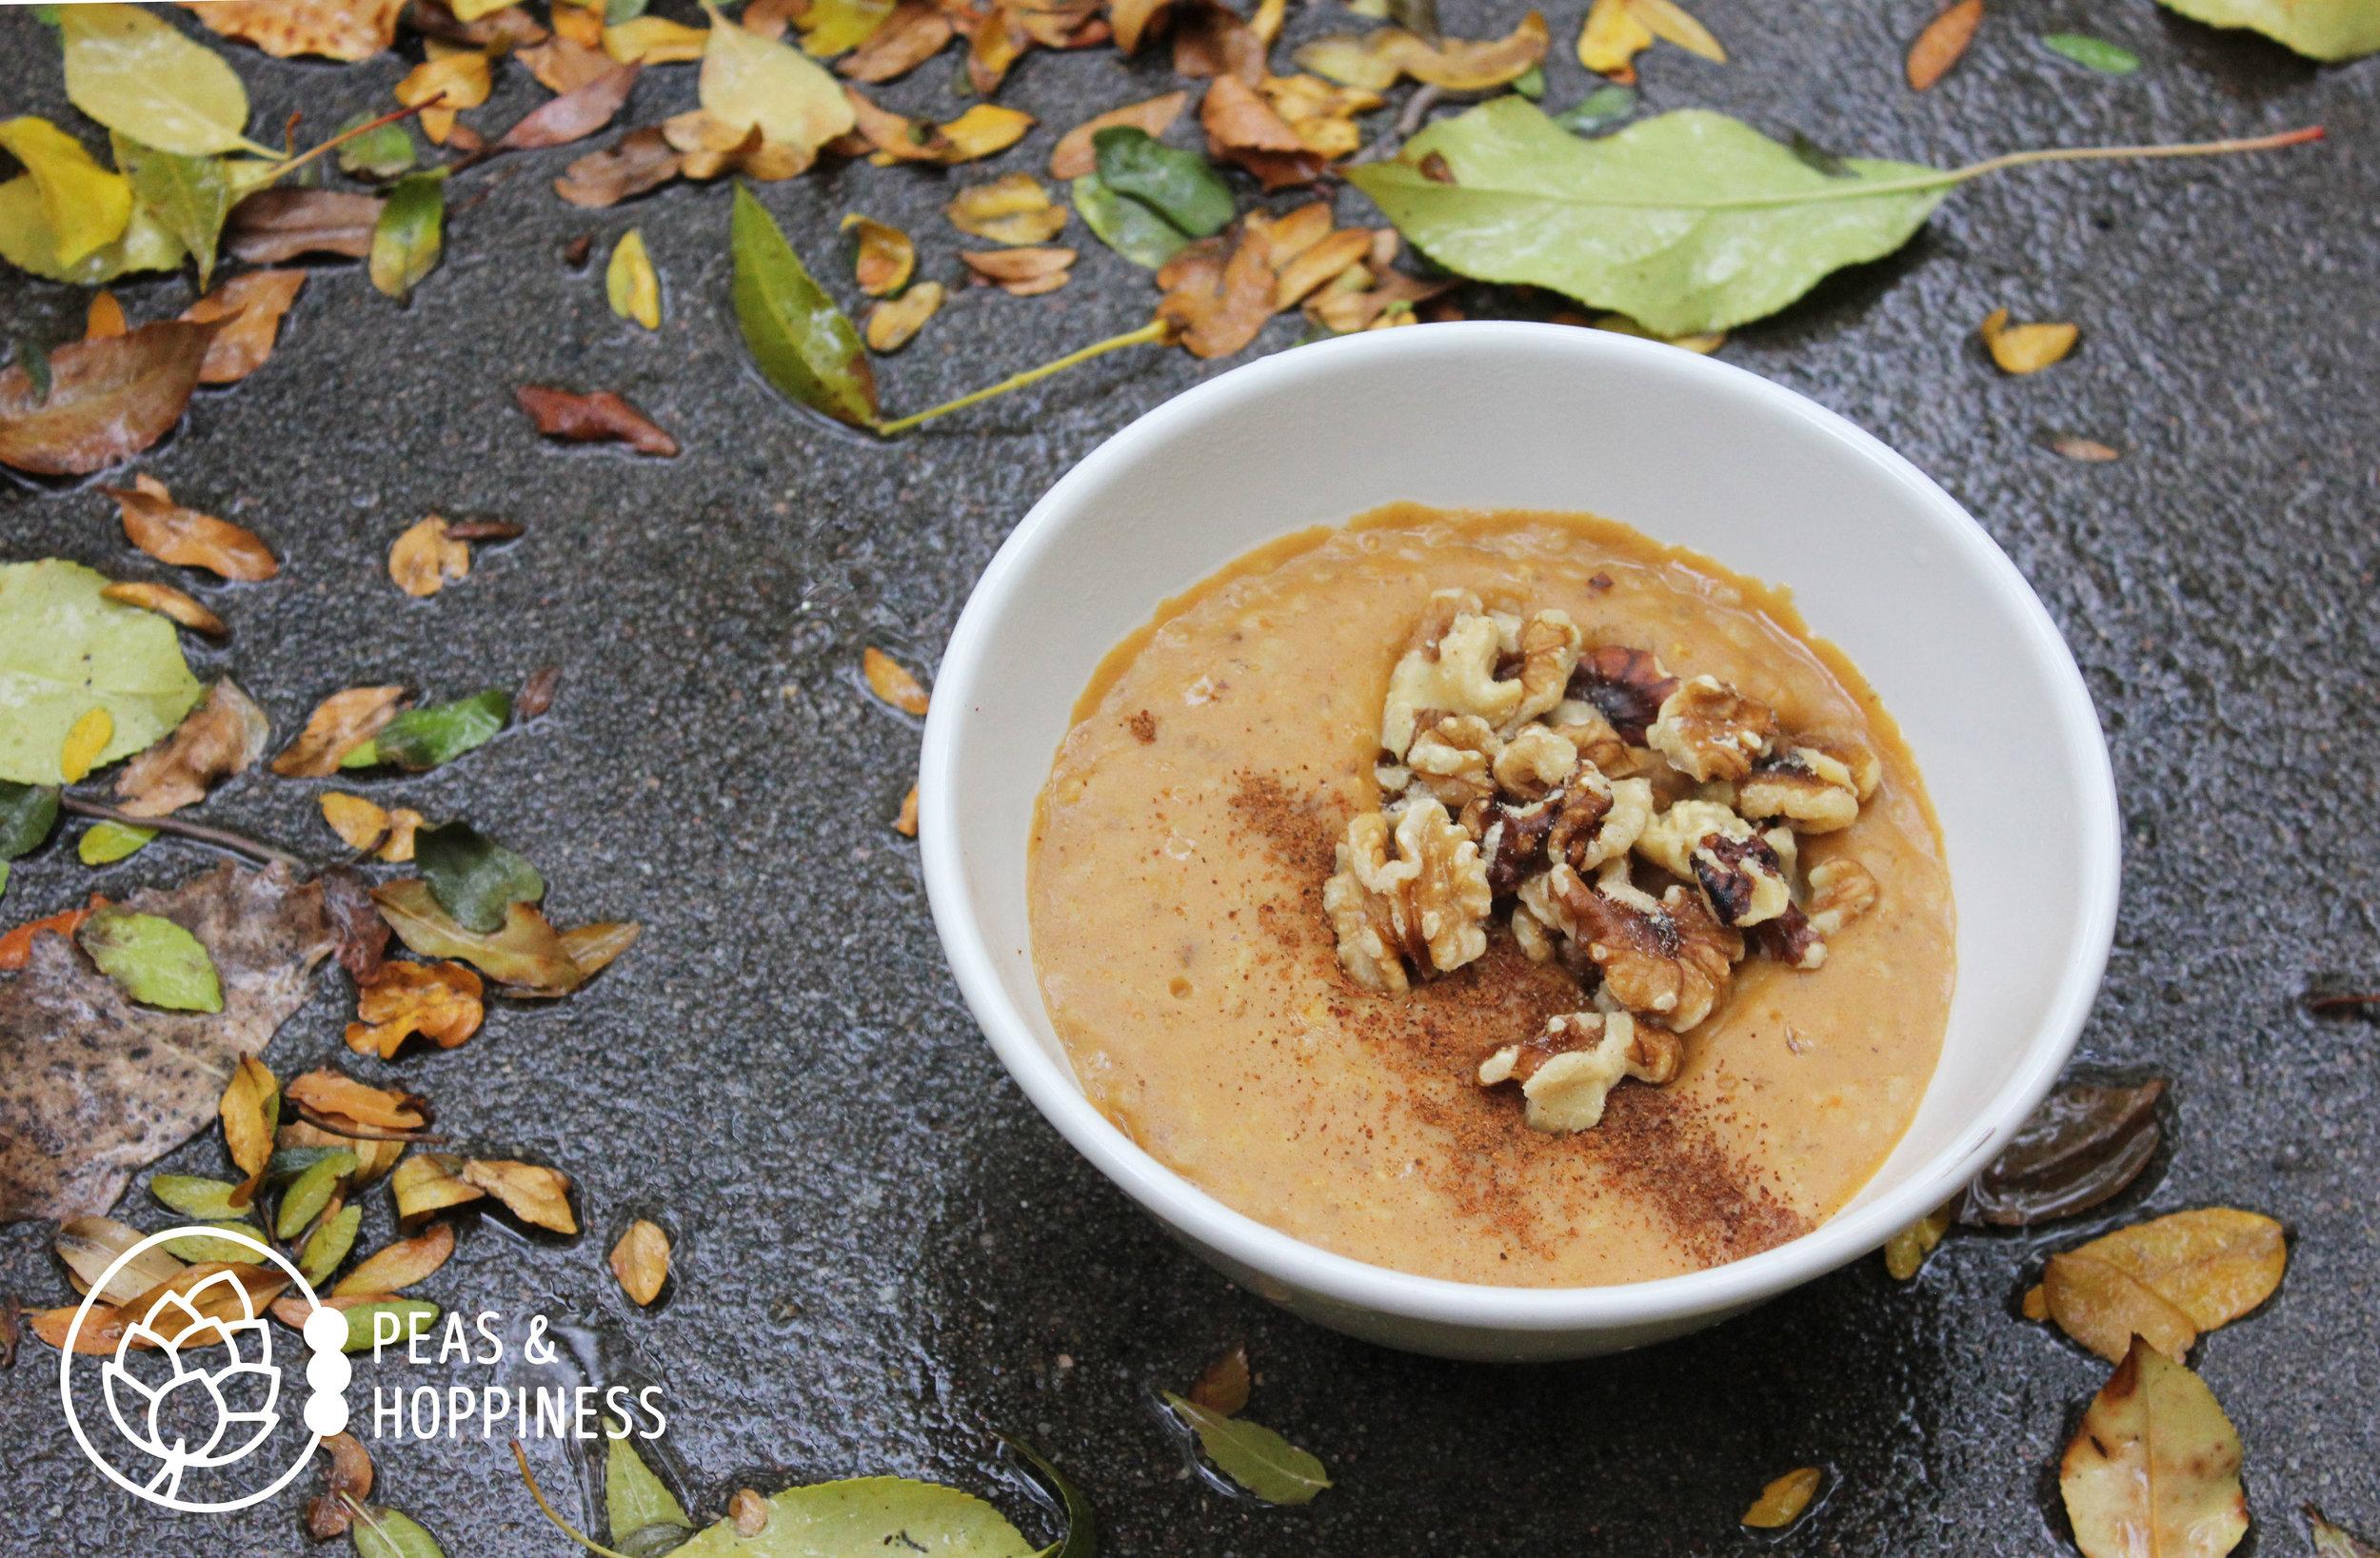 Pumpkin Porridge from Peas and Hoppiness - www.peasandhoppiness.com